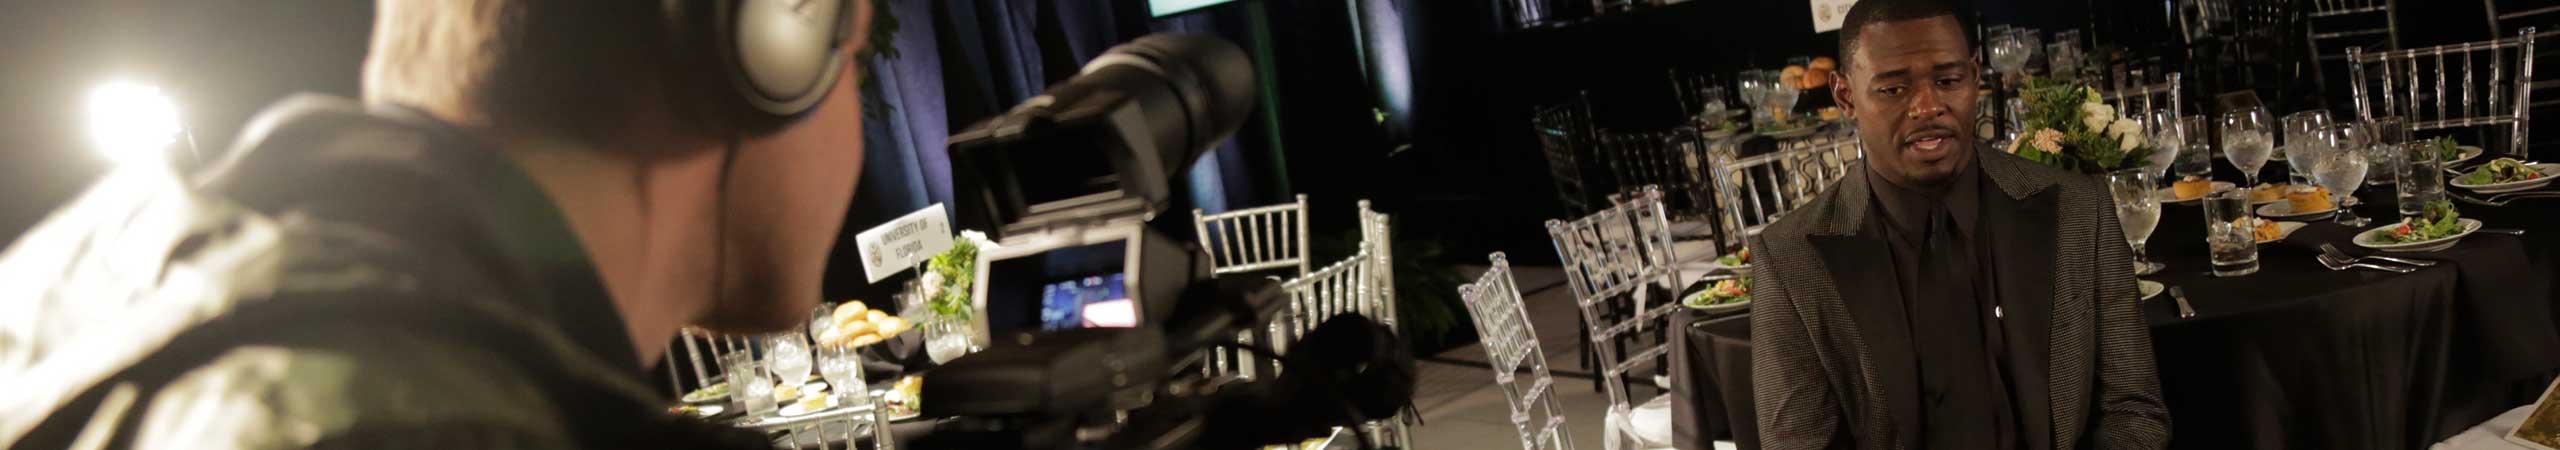 Jacksonville FL Video Production